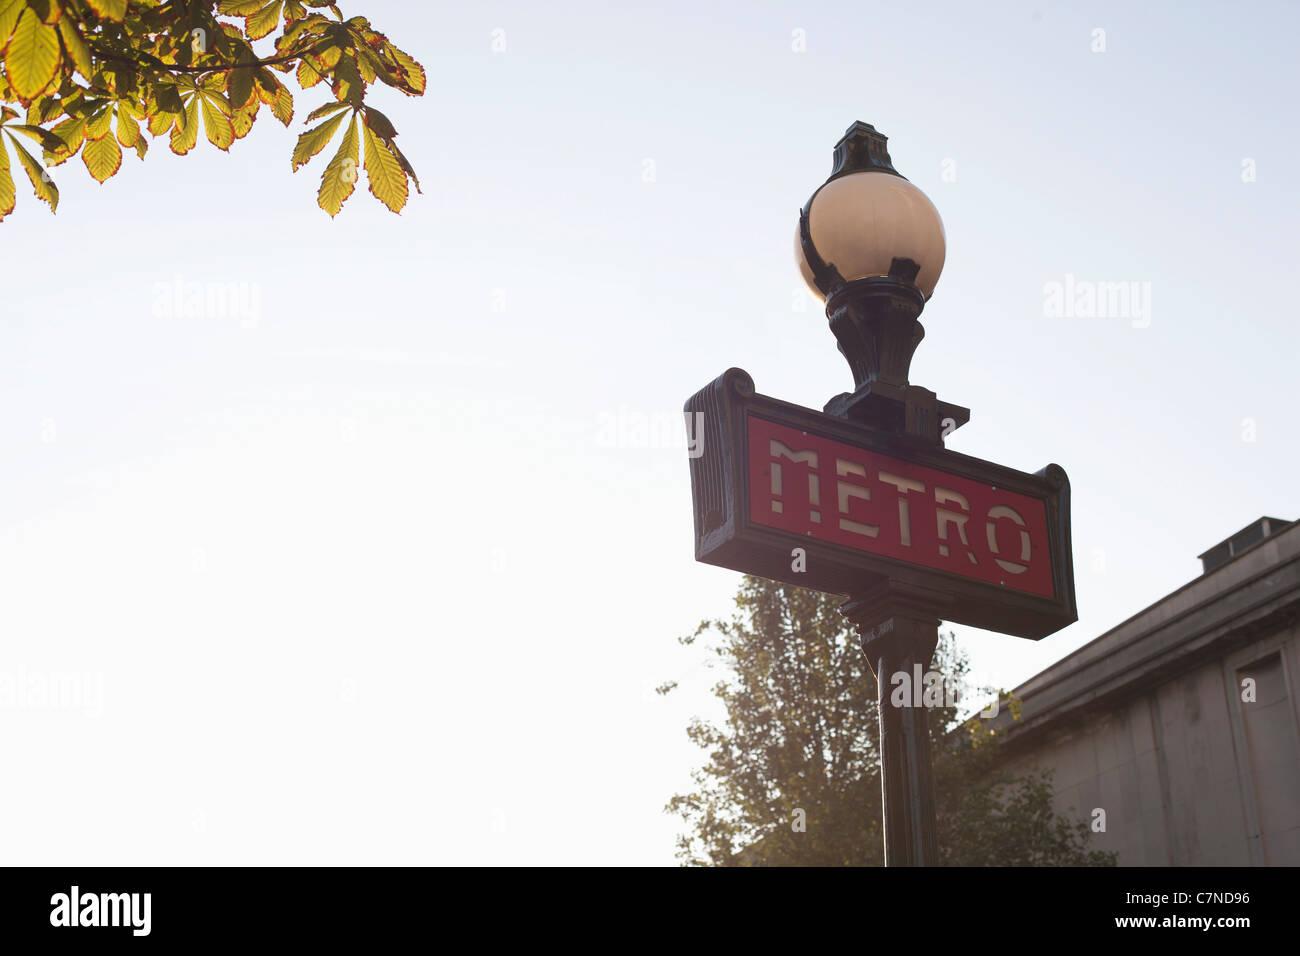 Low angle view of Metro sign, Paris, Ile-de-France, France - Stock Image